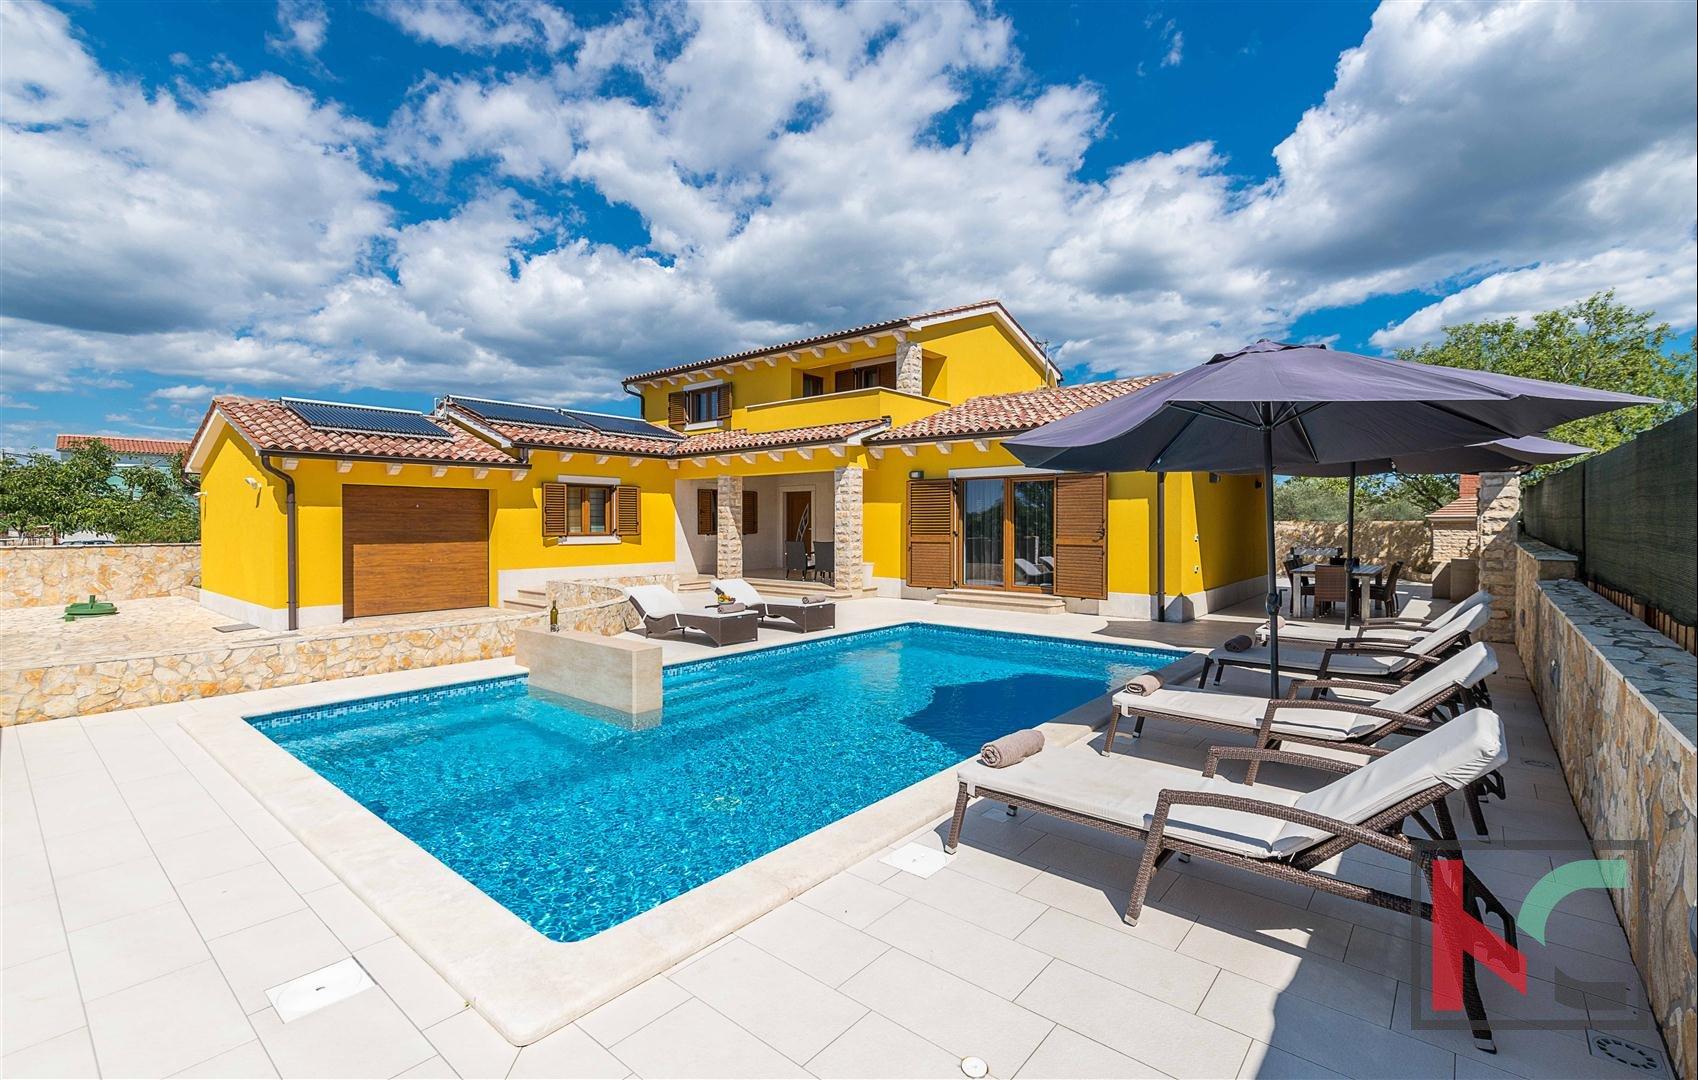 Istria Villa Moderna 280m2 Con Piscina Neel Con Pula